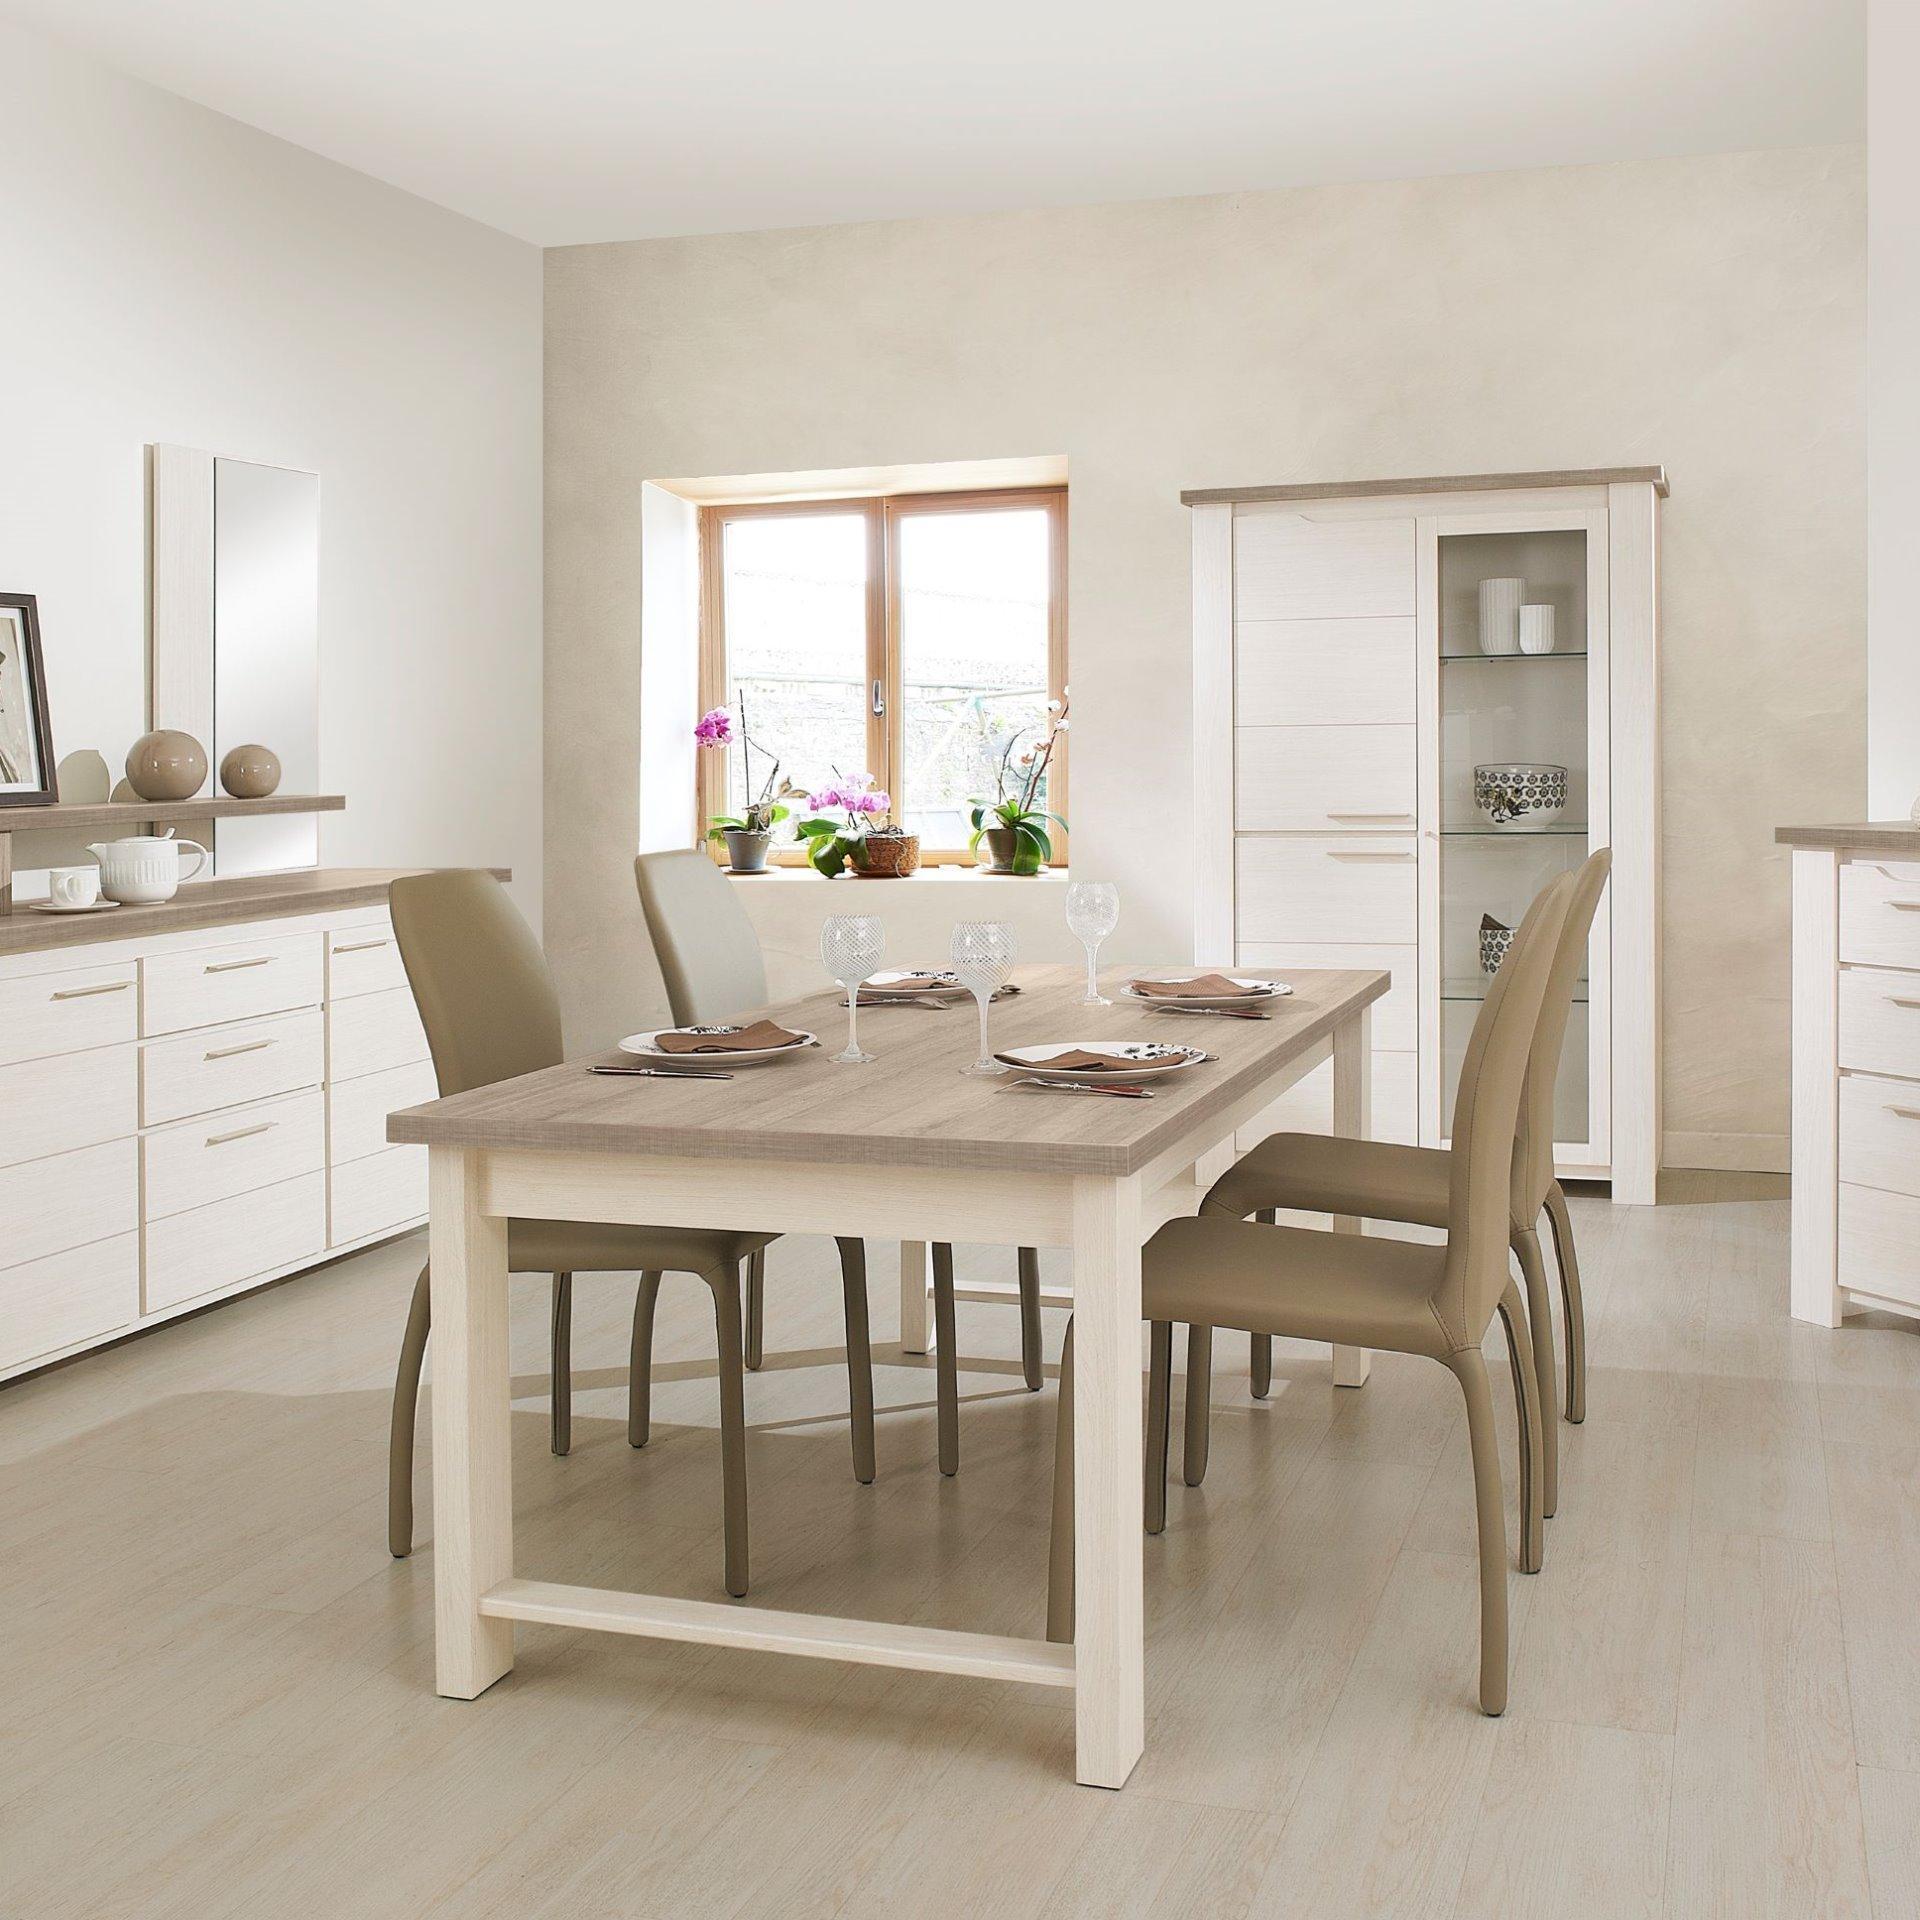 Bilrich Furniture Toscane Dining Table